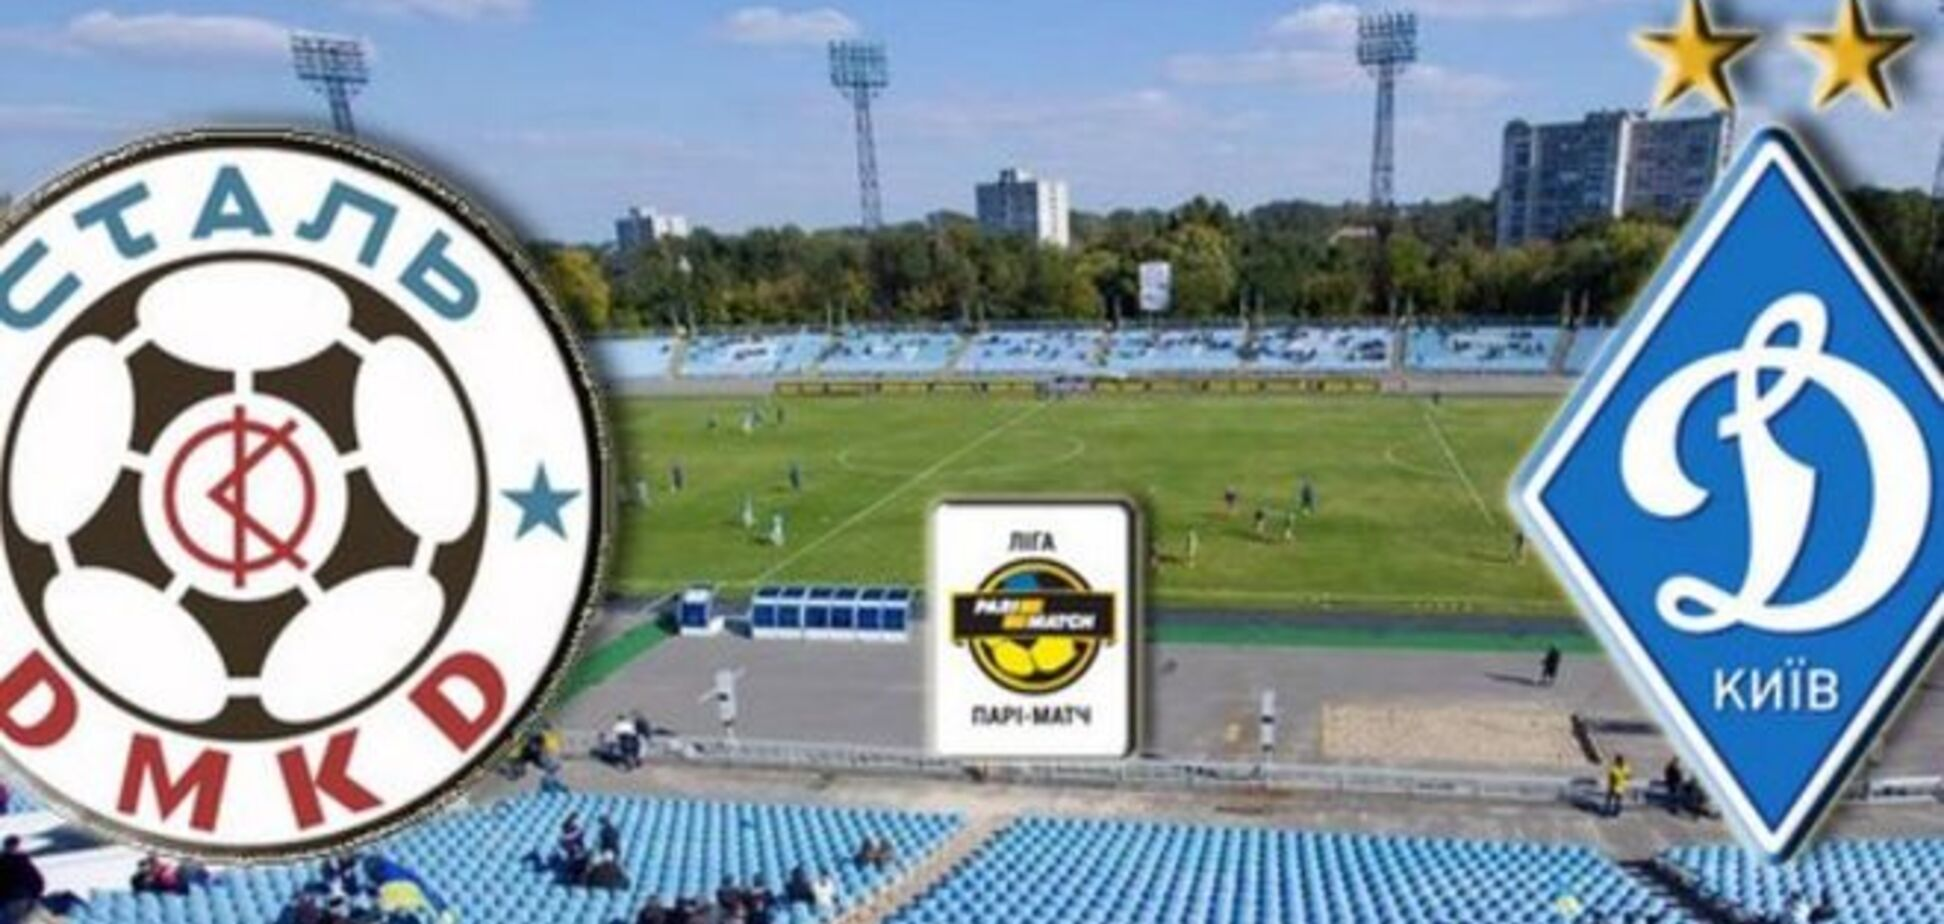 Сталь - Динамо: прогноз, де дивитися матч